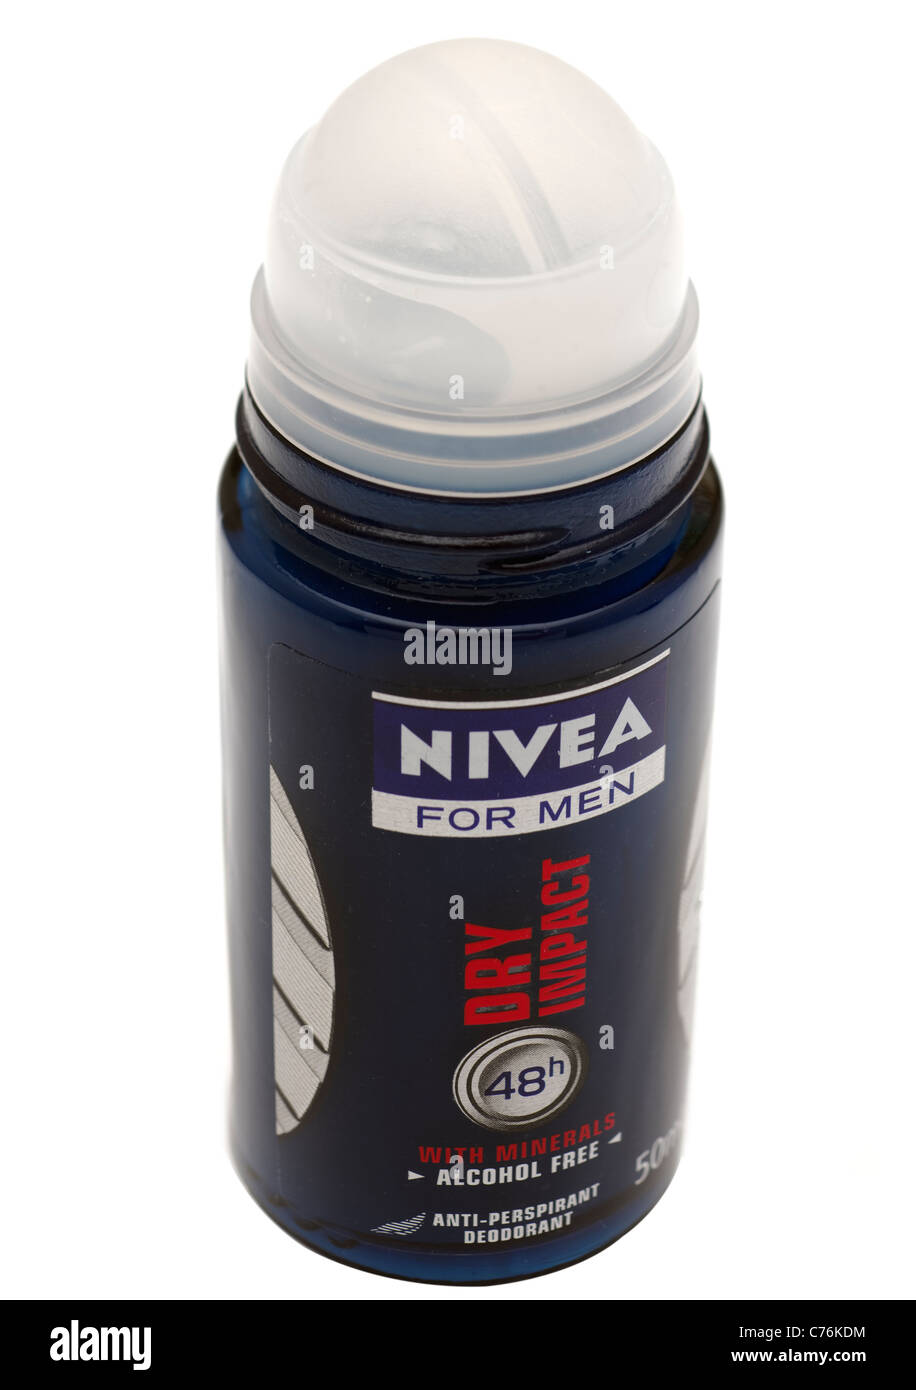 Underarm deodorant Nivea for men roll on - Stock Image